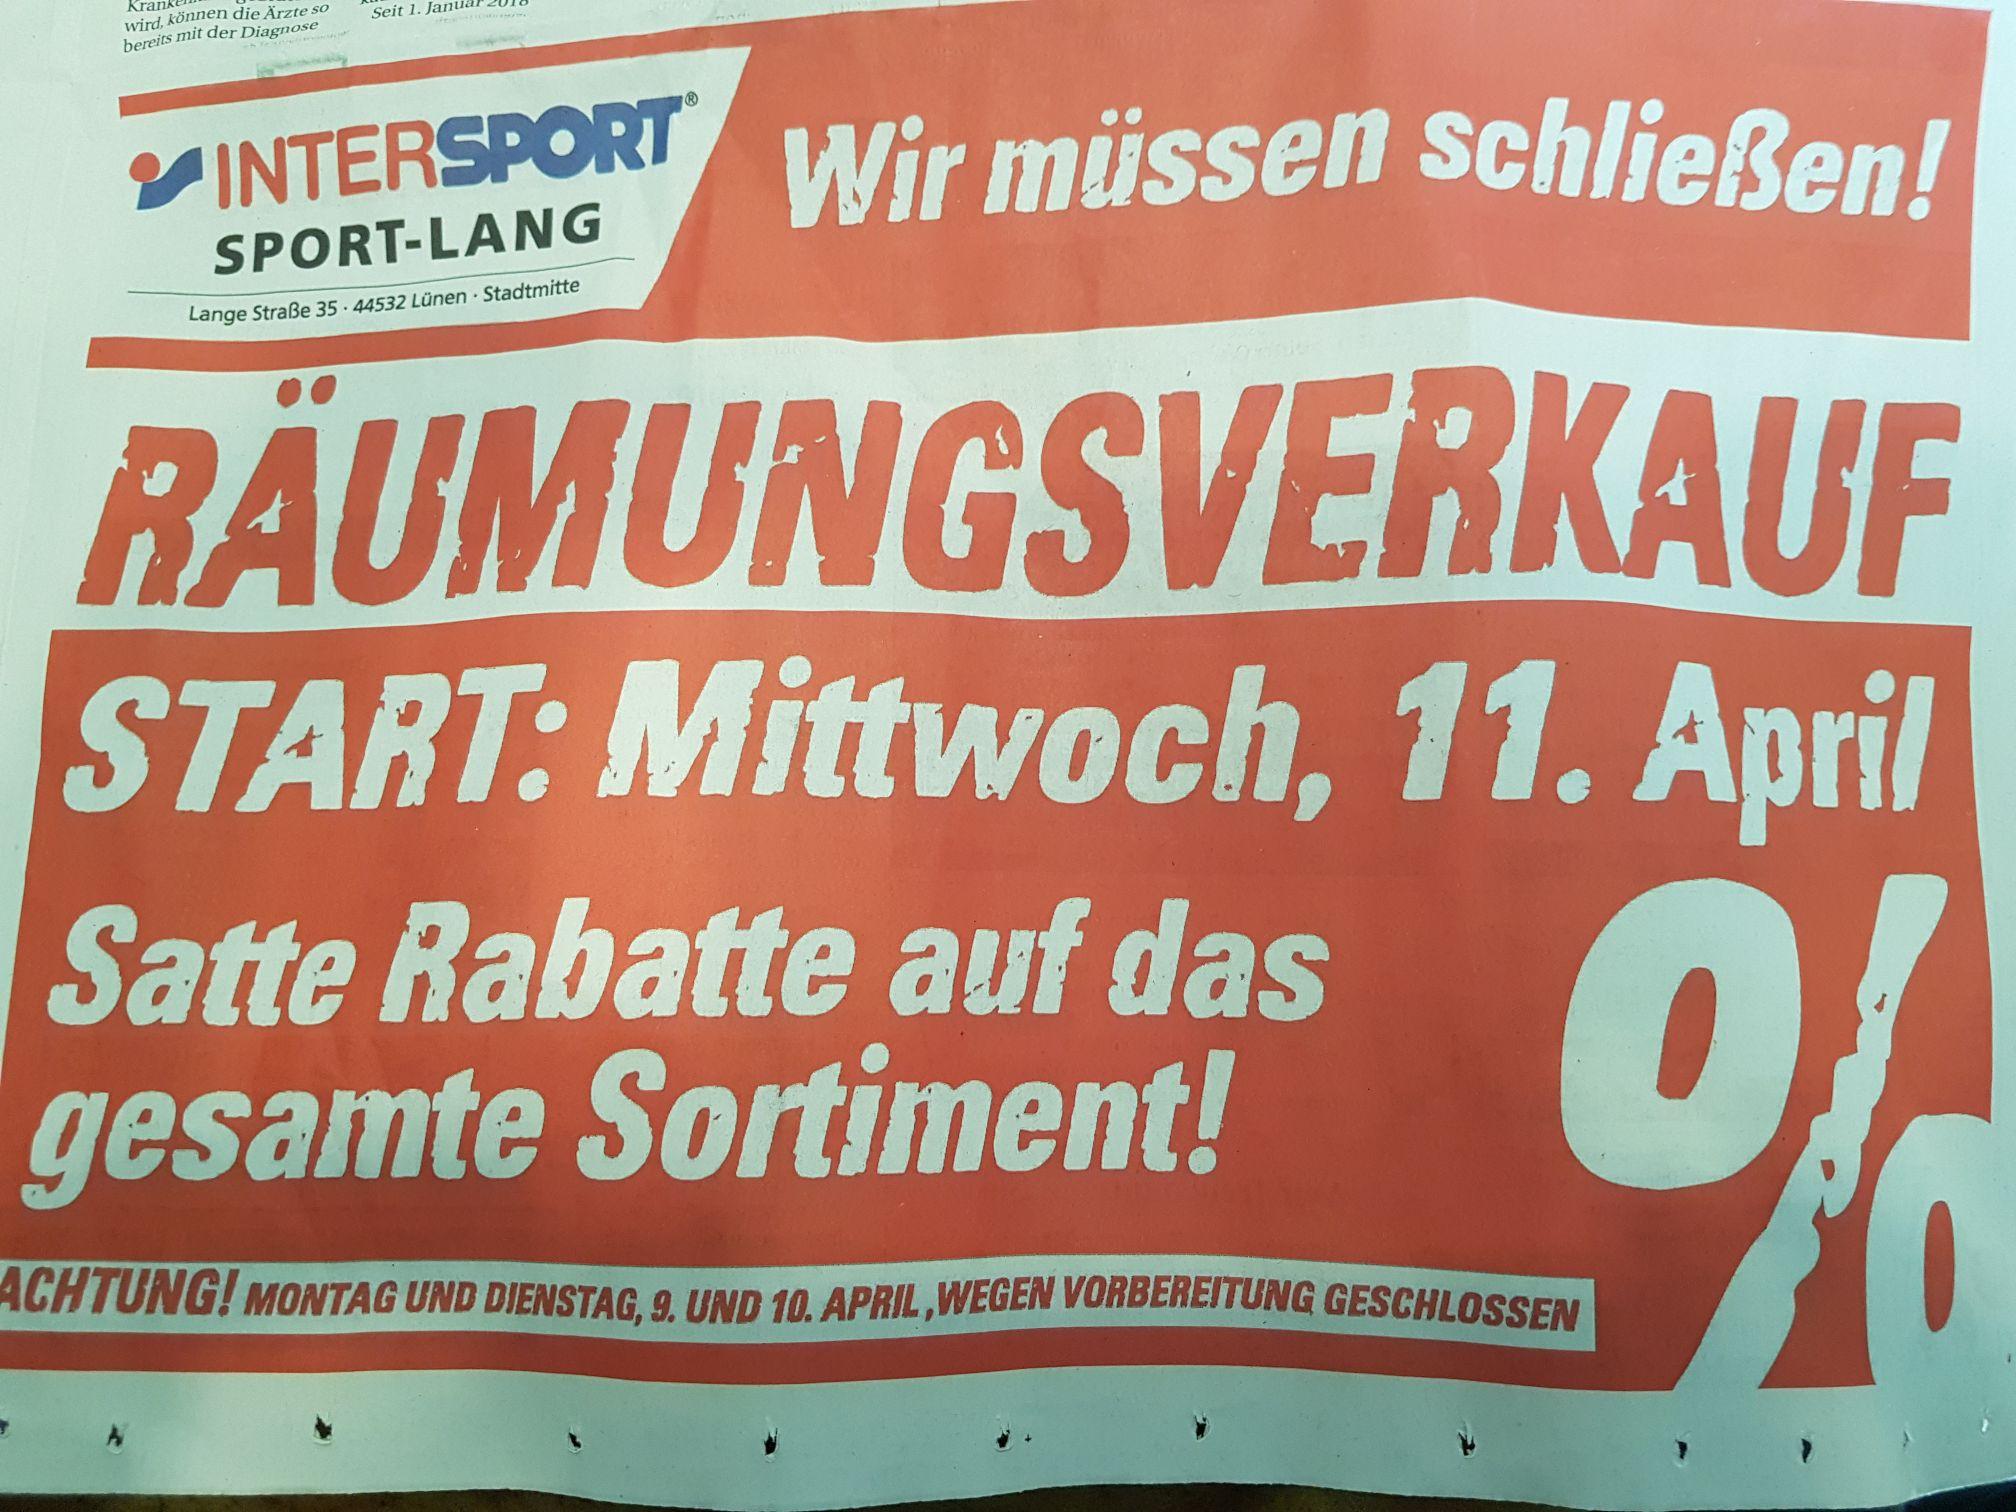 Intersport Sport-Lang in Lünen macht Räumungsverkauf